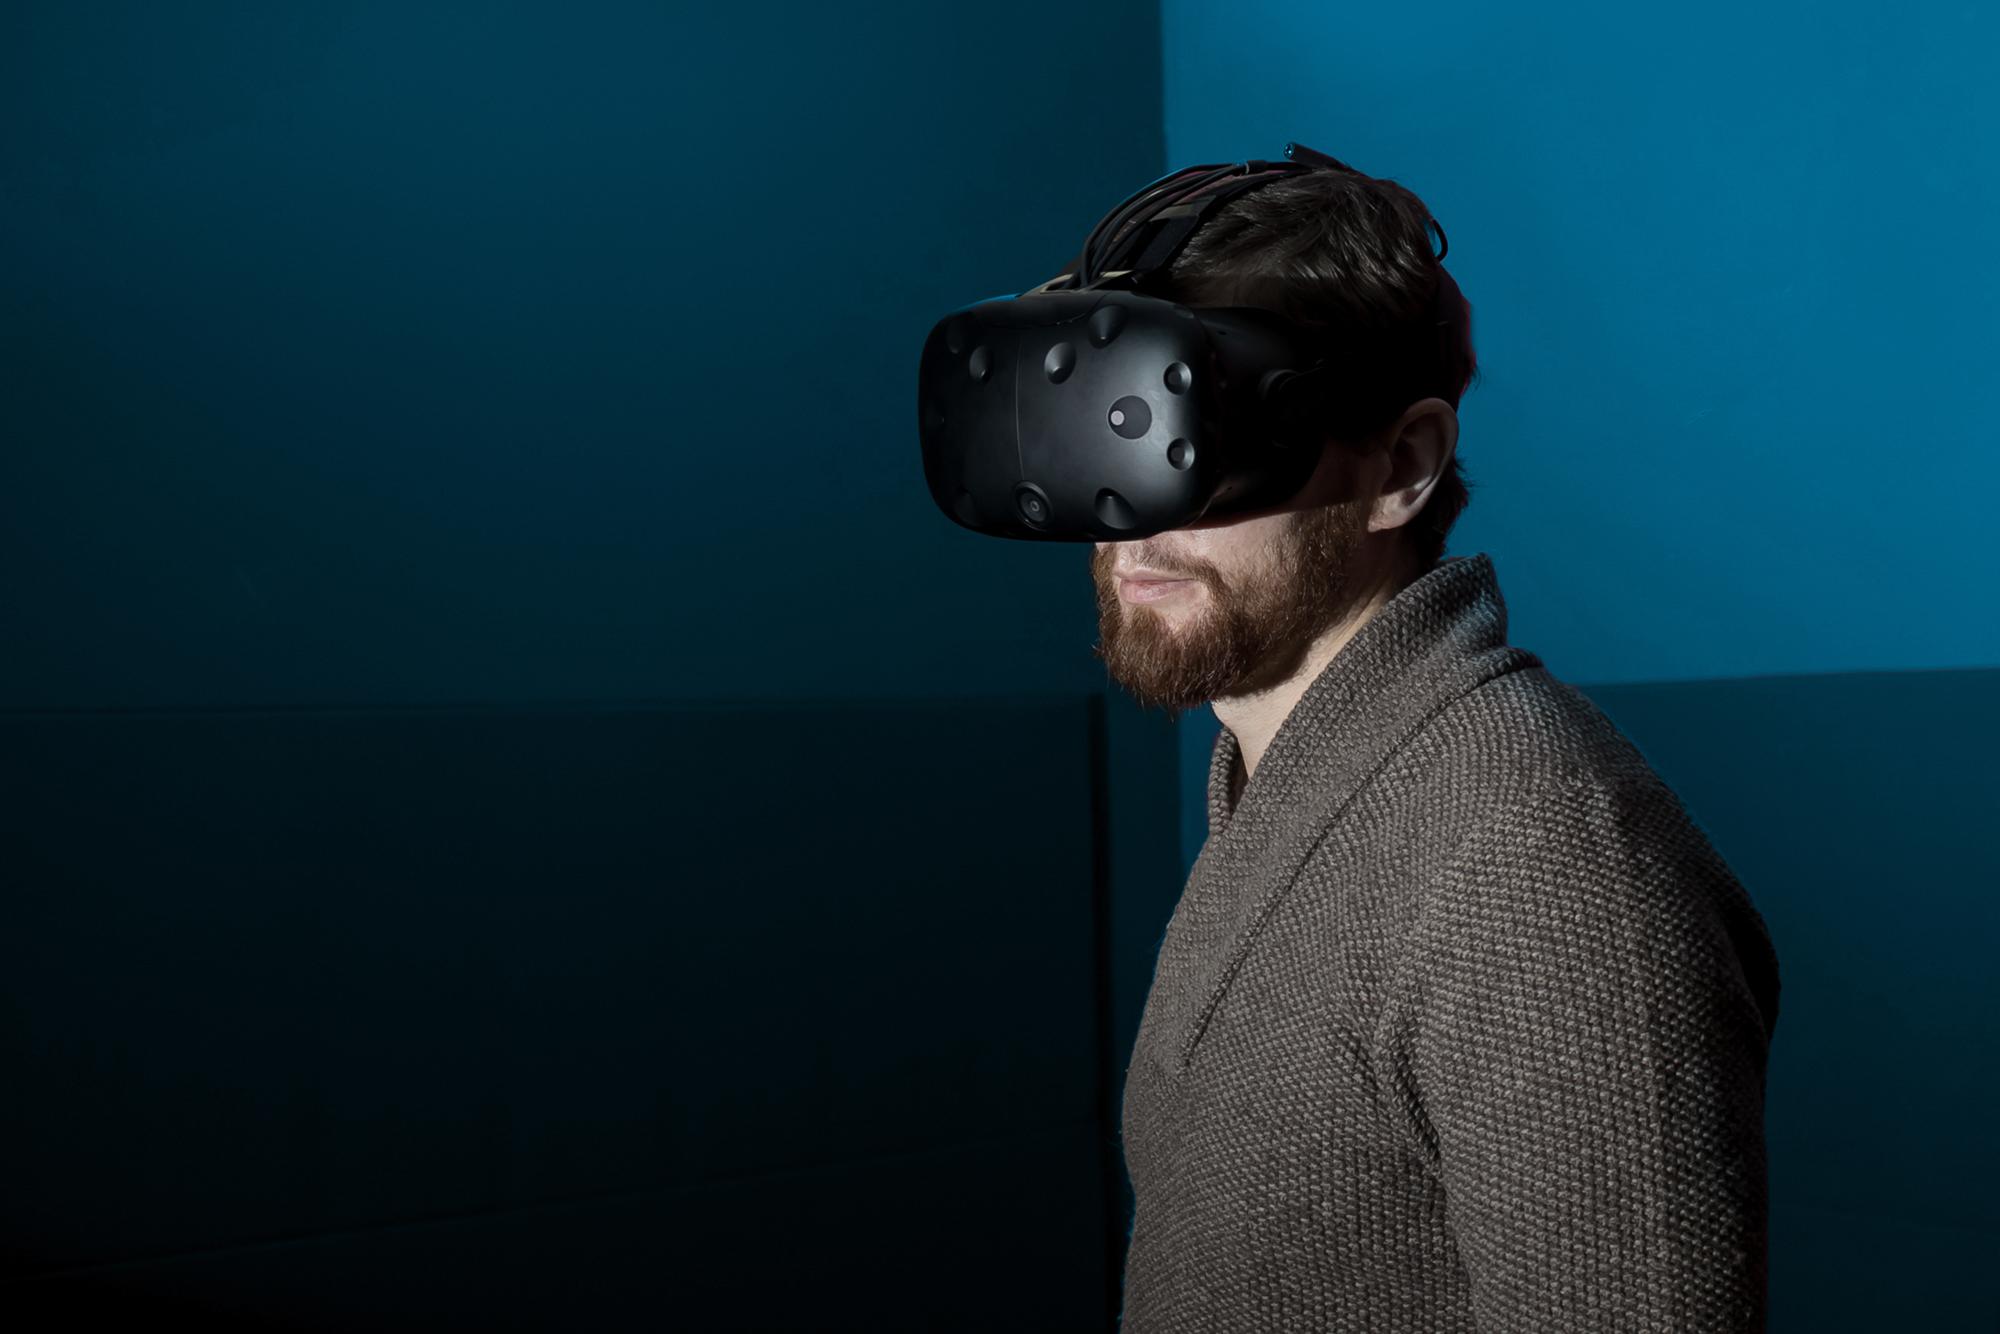 Tools of virtual reality